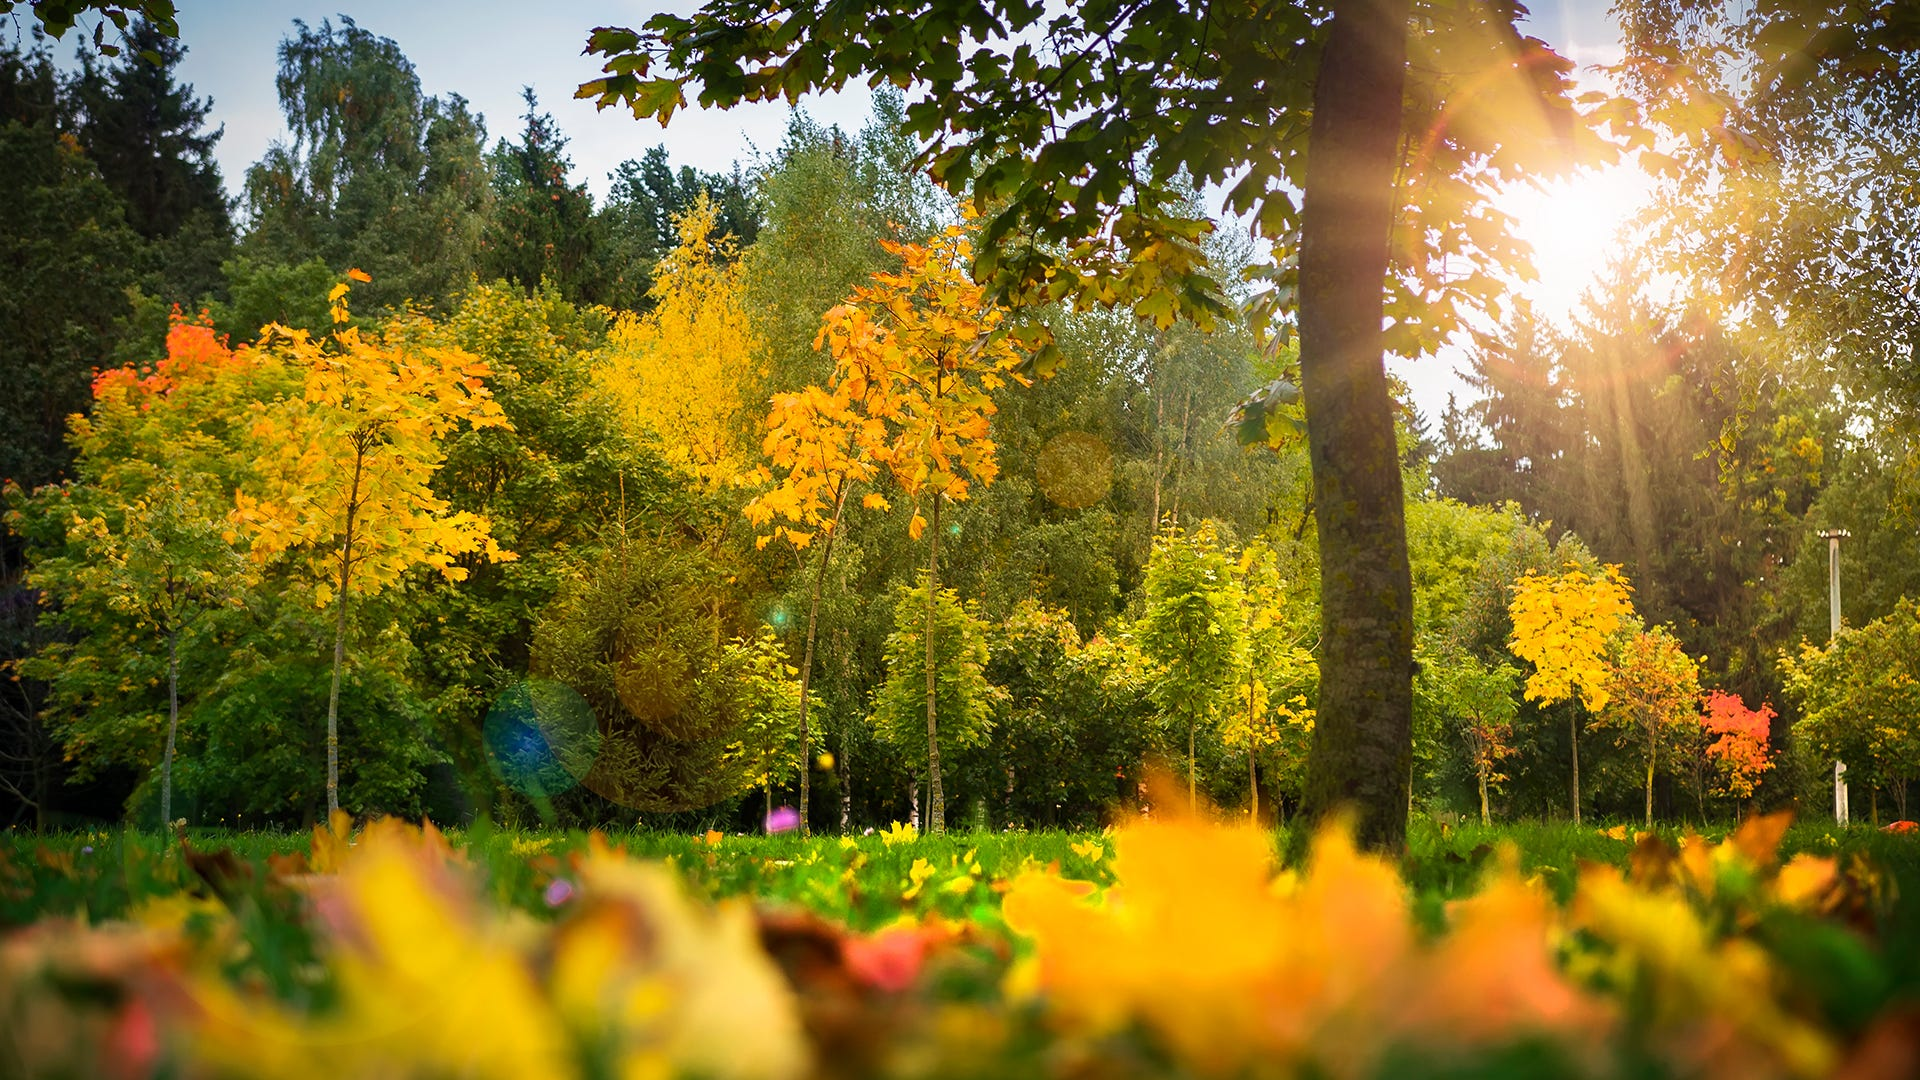 Dynatrap fall maintenance